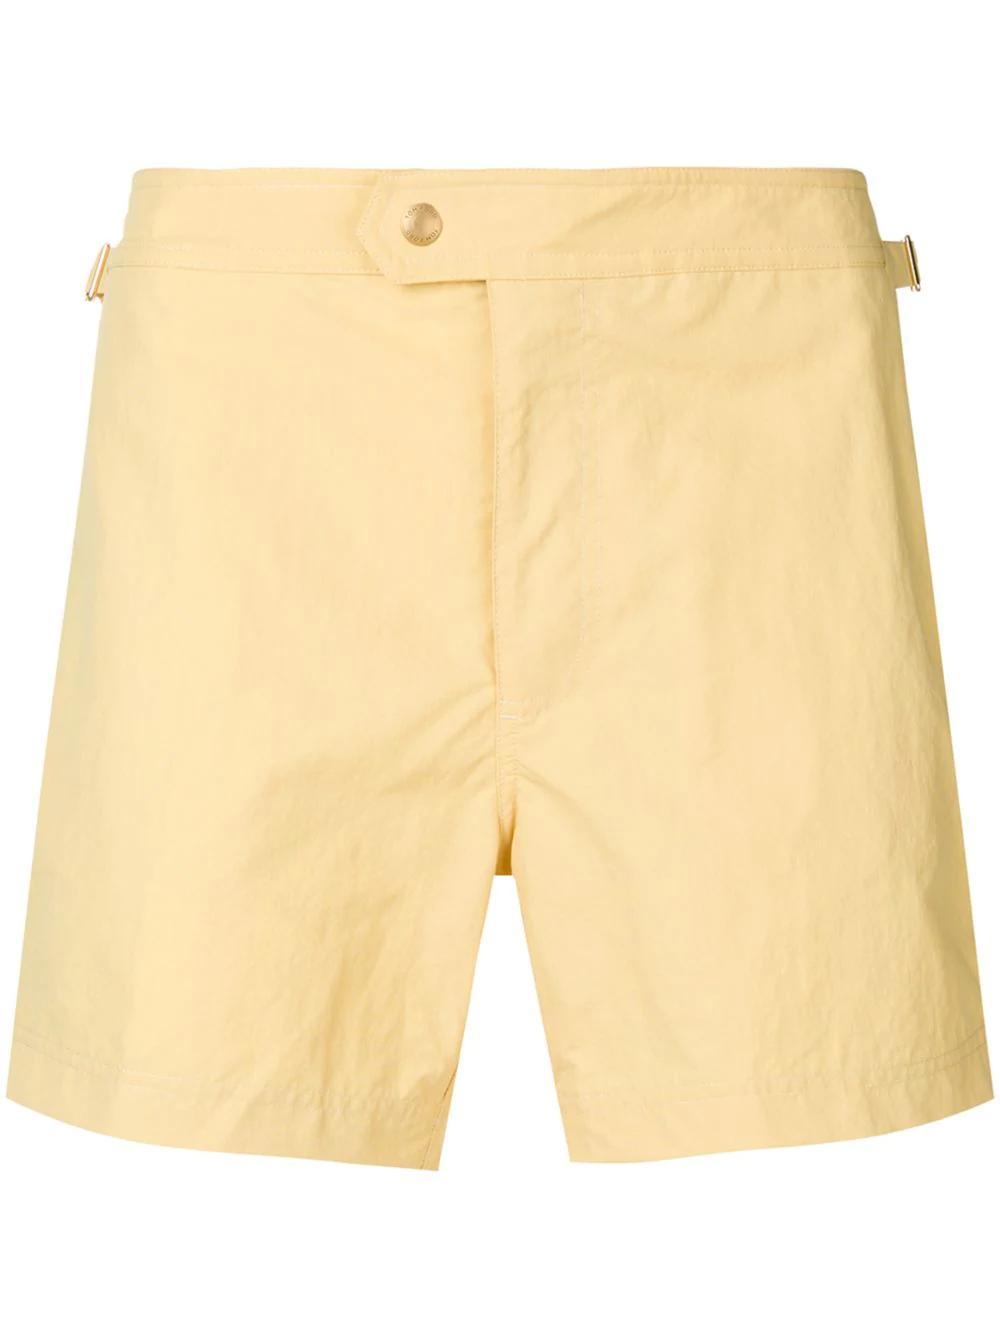 697a508e66 Tom Ford Classic Swim Shorts - Yellow | ModeSens